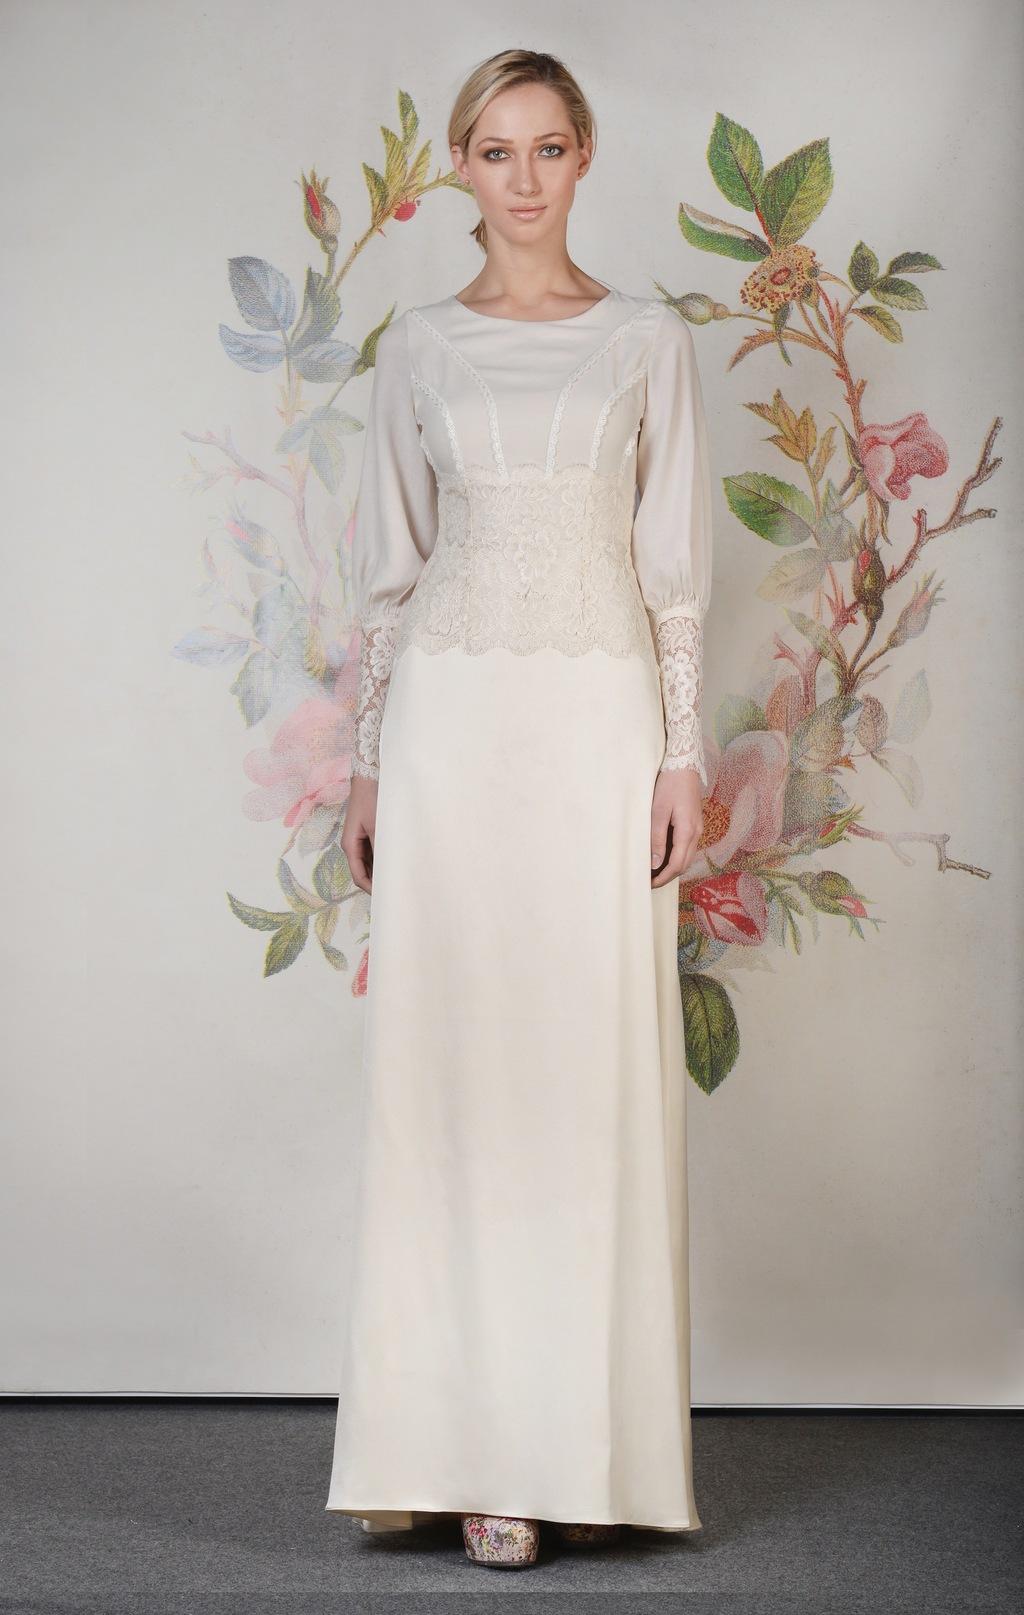 Claire-pettibone-spring-summer-2014-wedding-dress-estelle_f_01.full